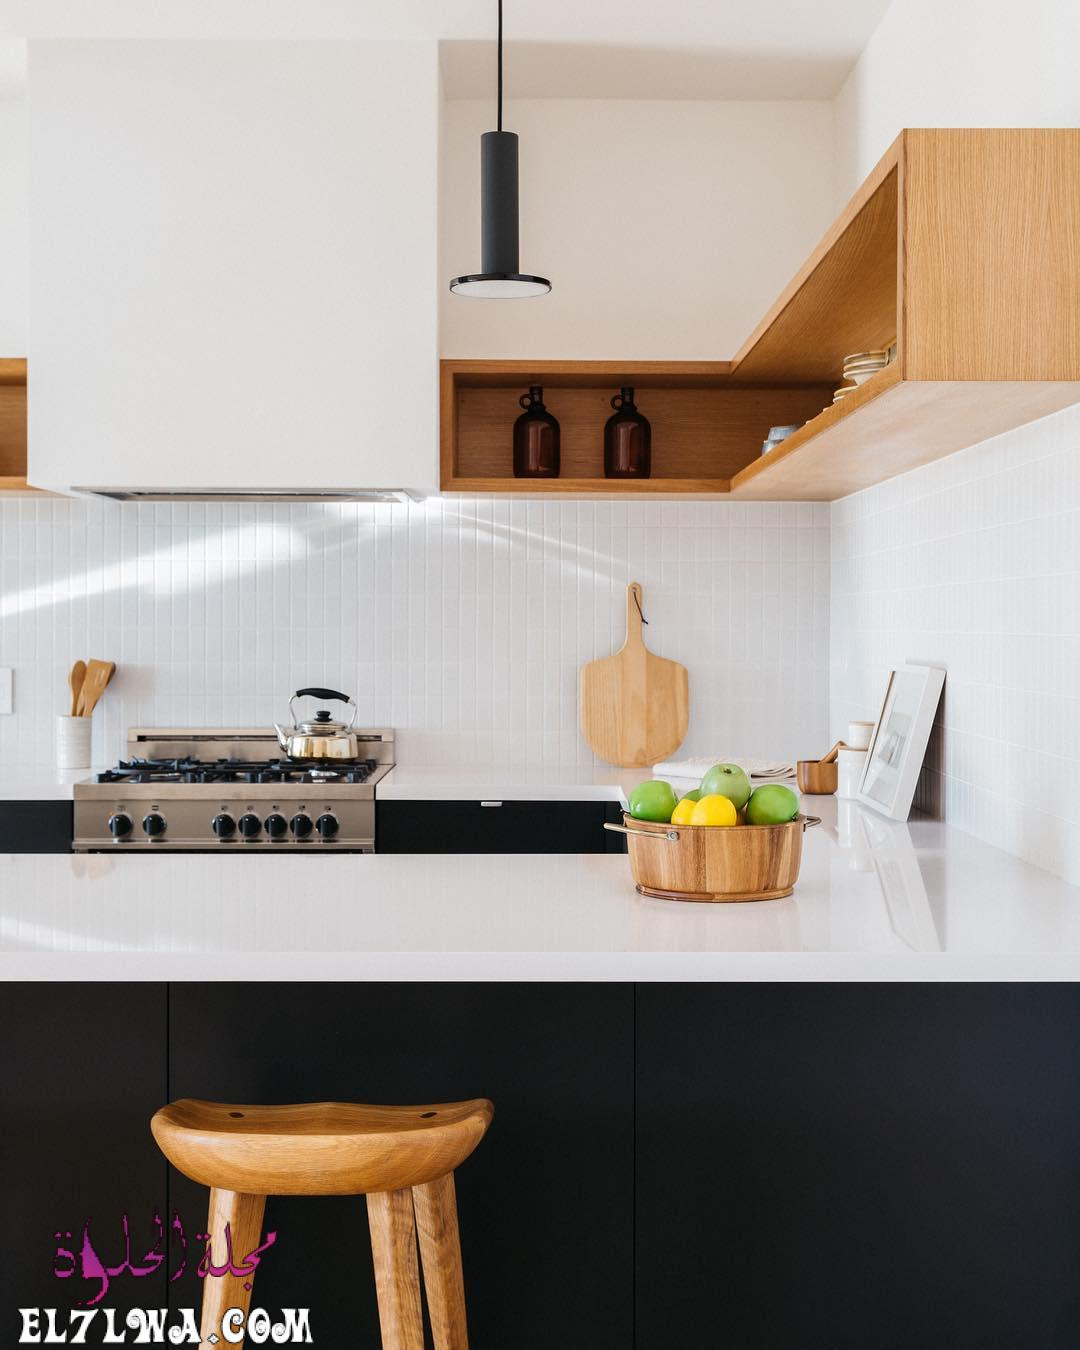 american kitchen design bertazzoni italian kitchen 45 - ديكورات مطابخ 2021 صور مطابخ